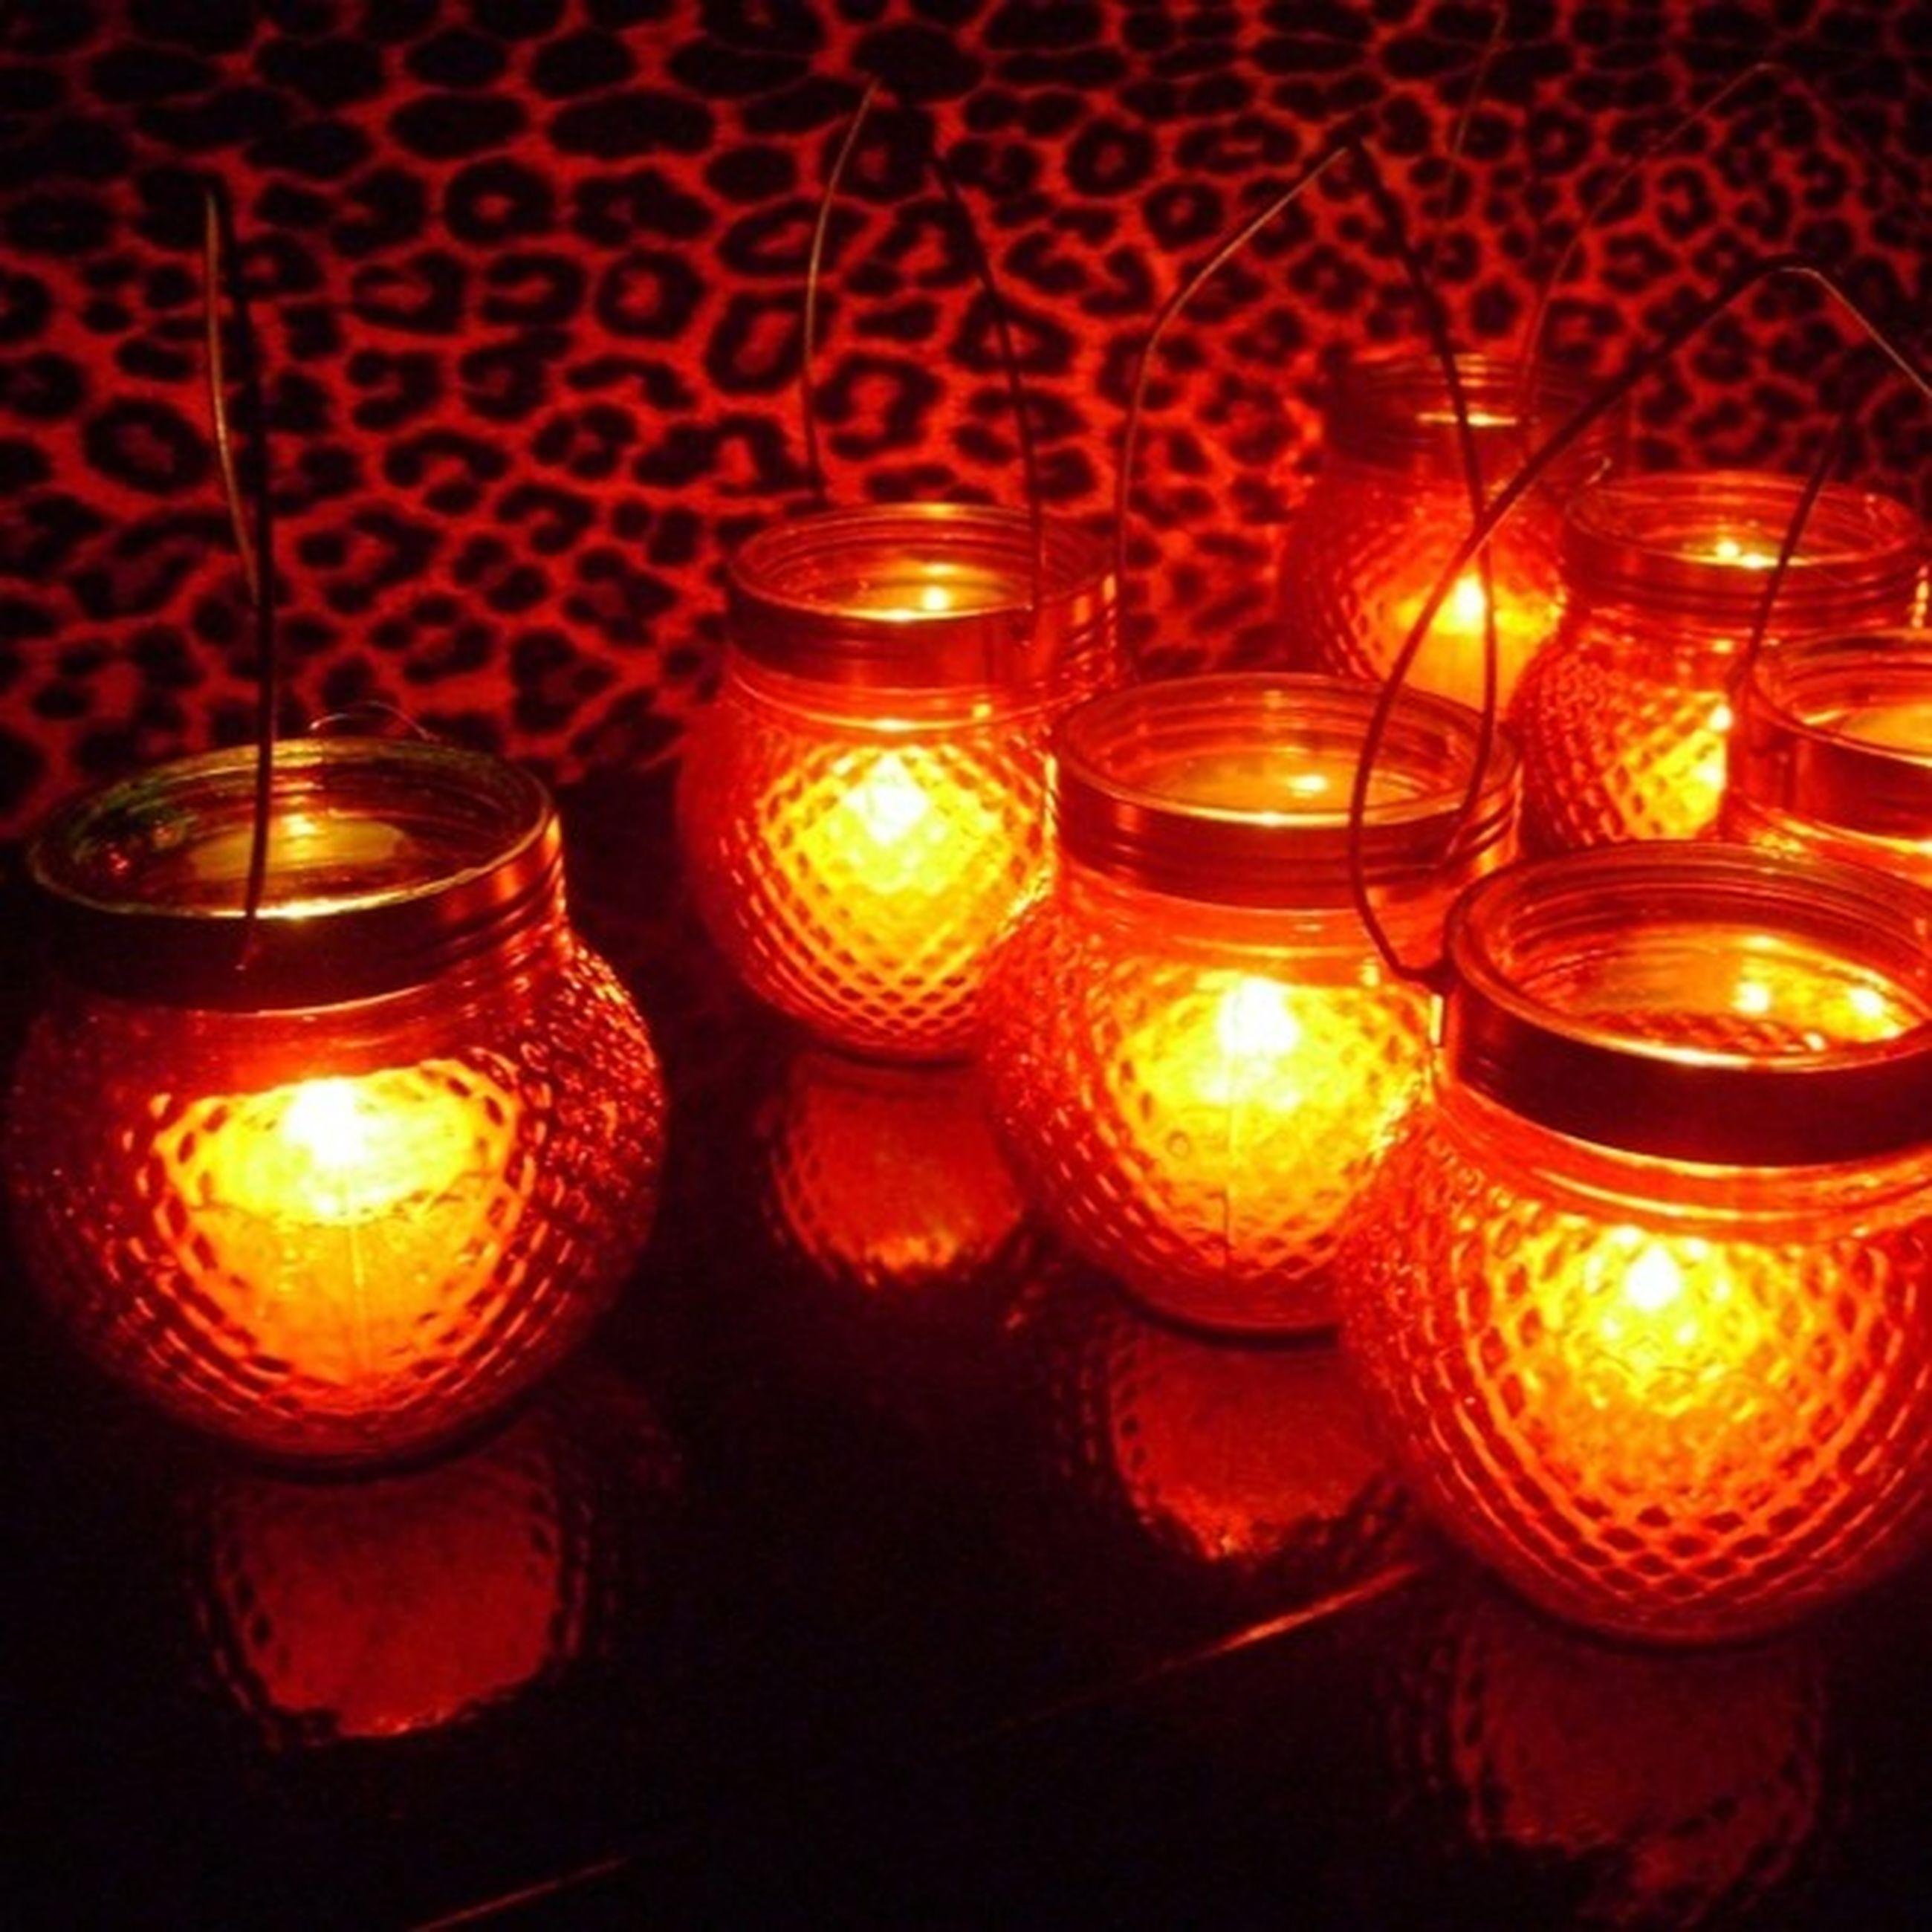 illuminated, indoors, lighting equipment, lantern, decoration, night, celebration, hanging, candle, glowing, christmas, tradition, cultures, close-up, orange color, christmas decoration, decor, electricity, flame, lit